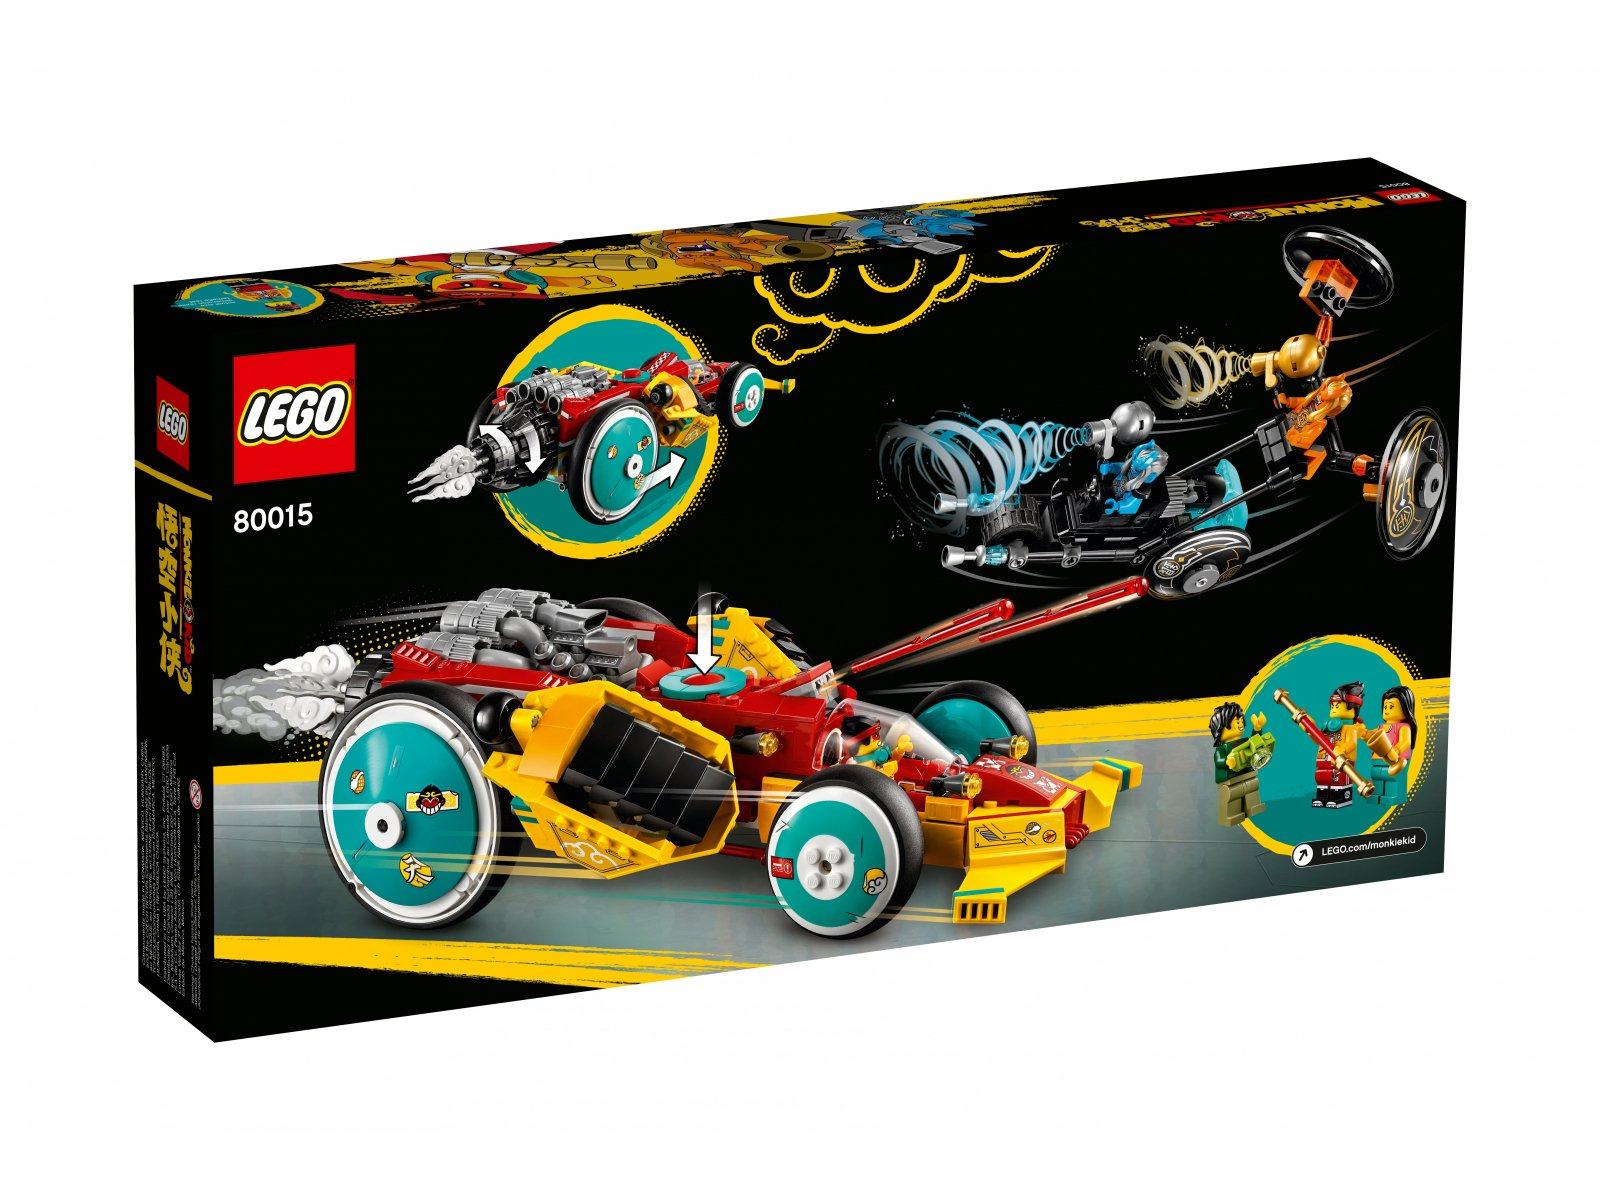 LEGO Monkie Kid™ Chmurkowy roadster Monkie Kida 80015